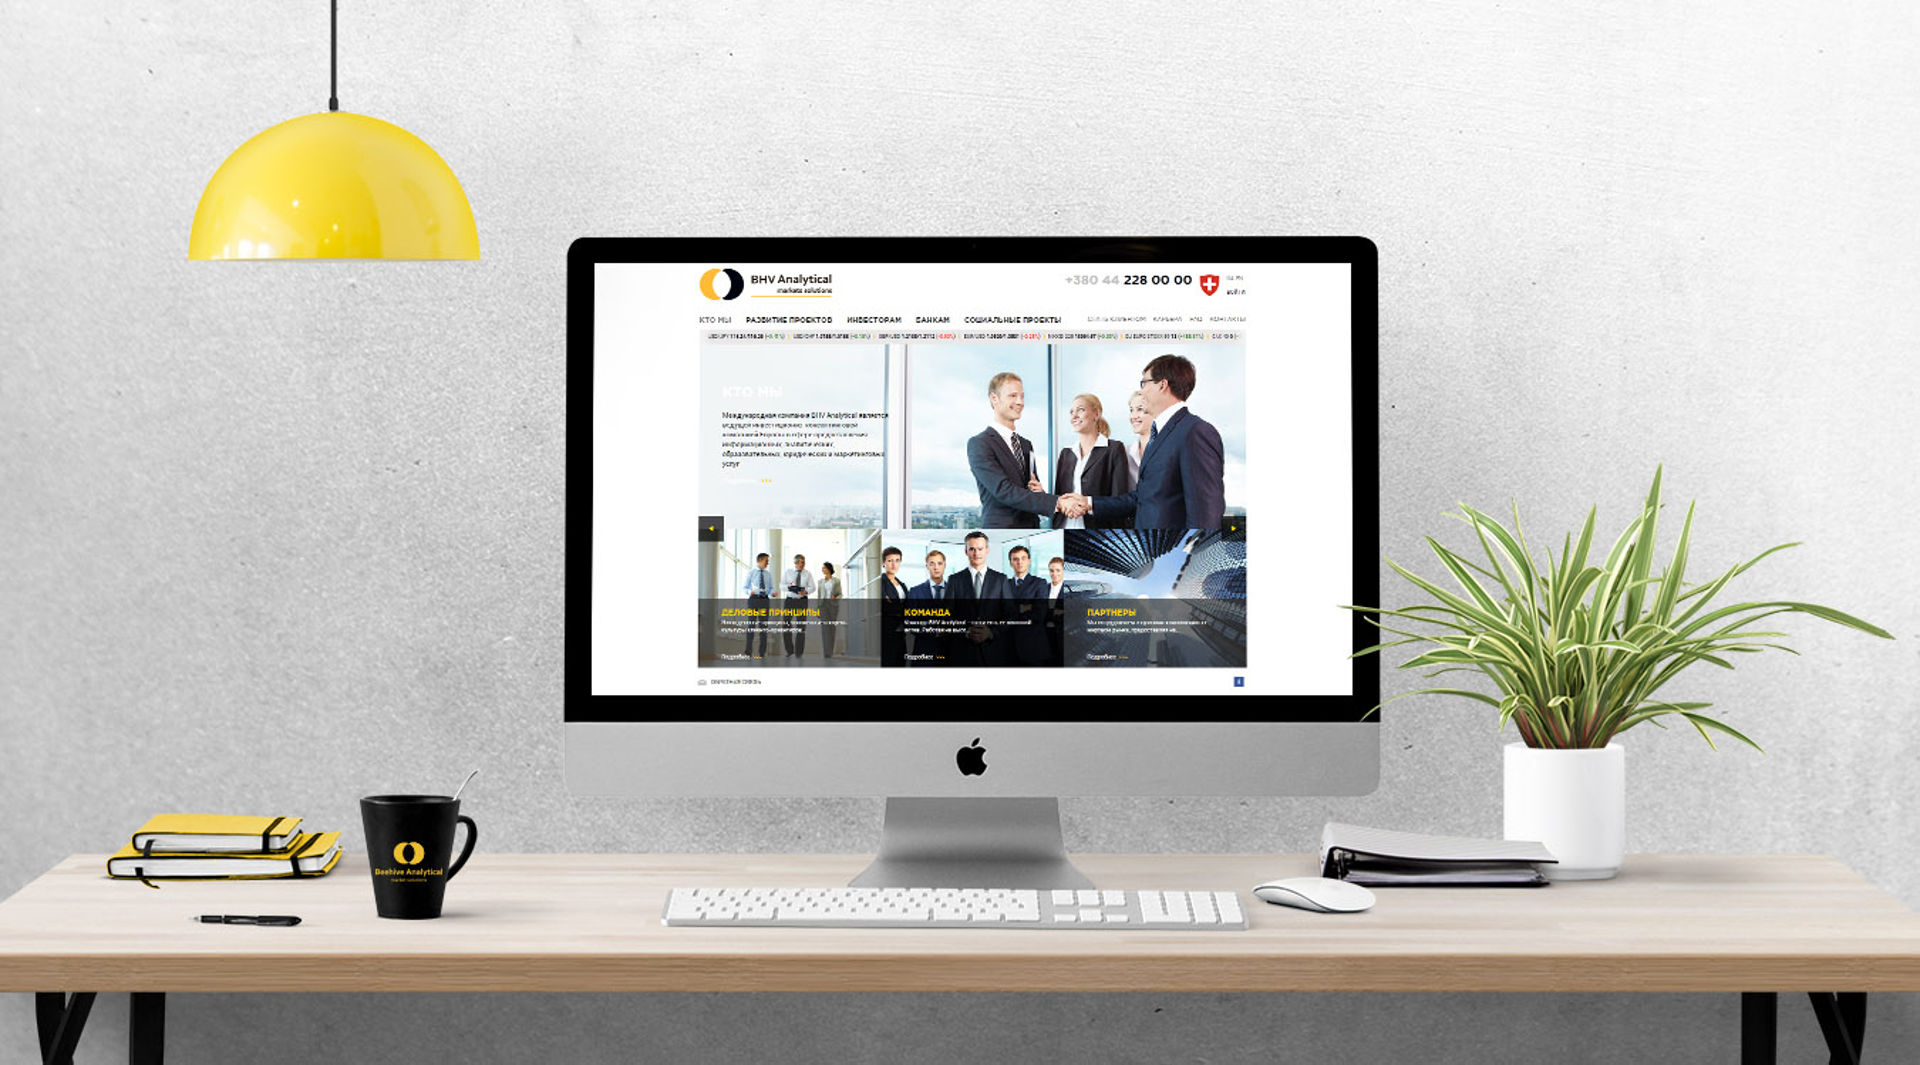 Дизайн of the website of a financial company, Finance company web design